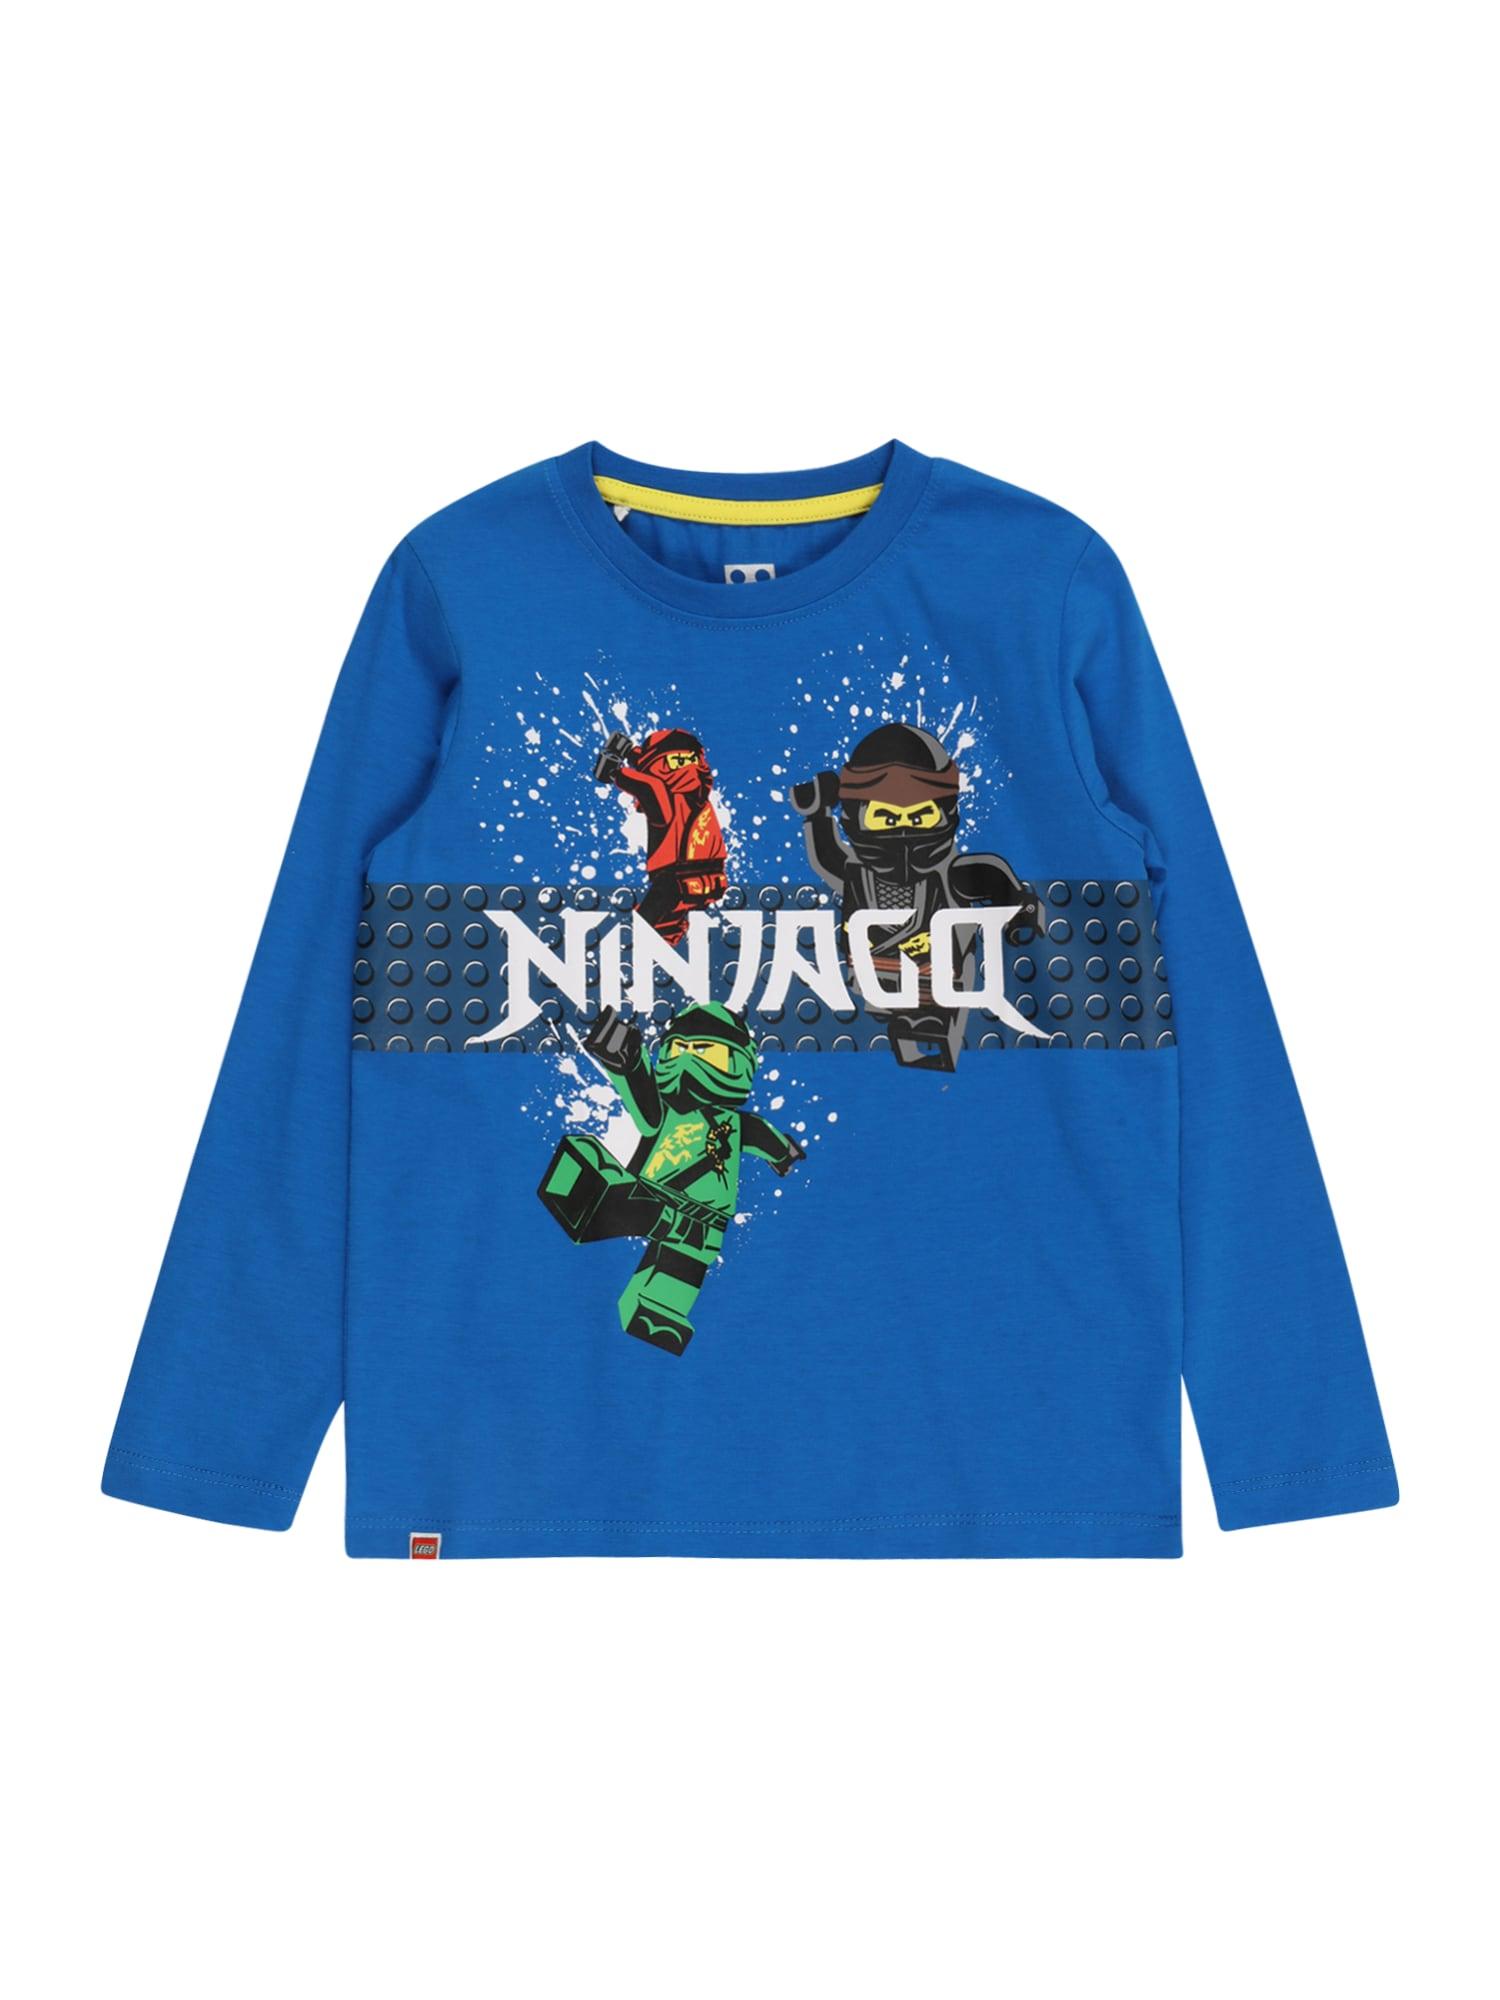 LEGO WEAR Marškinėliai mėlyna / balta / raudona / juoda / žalia